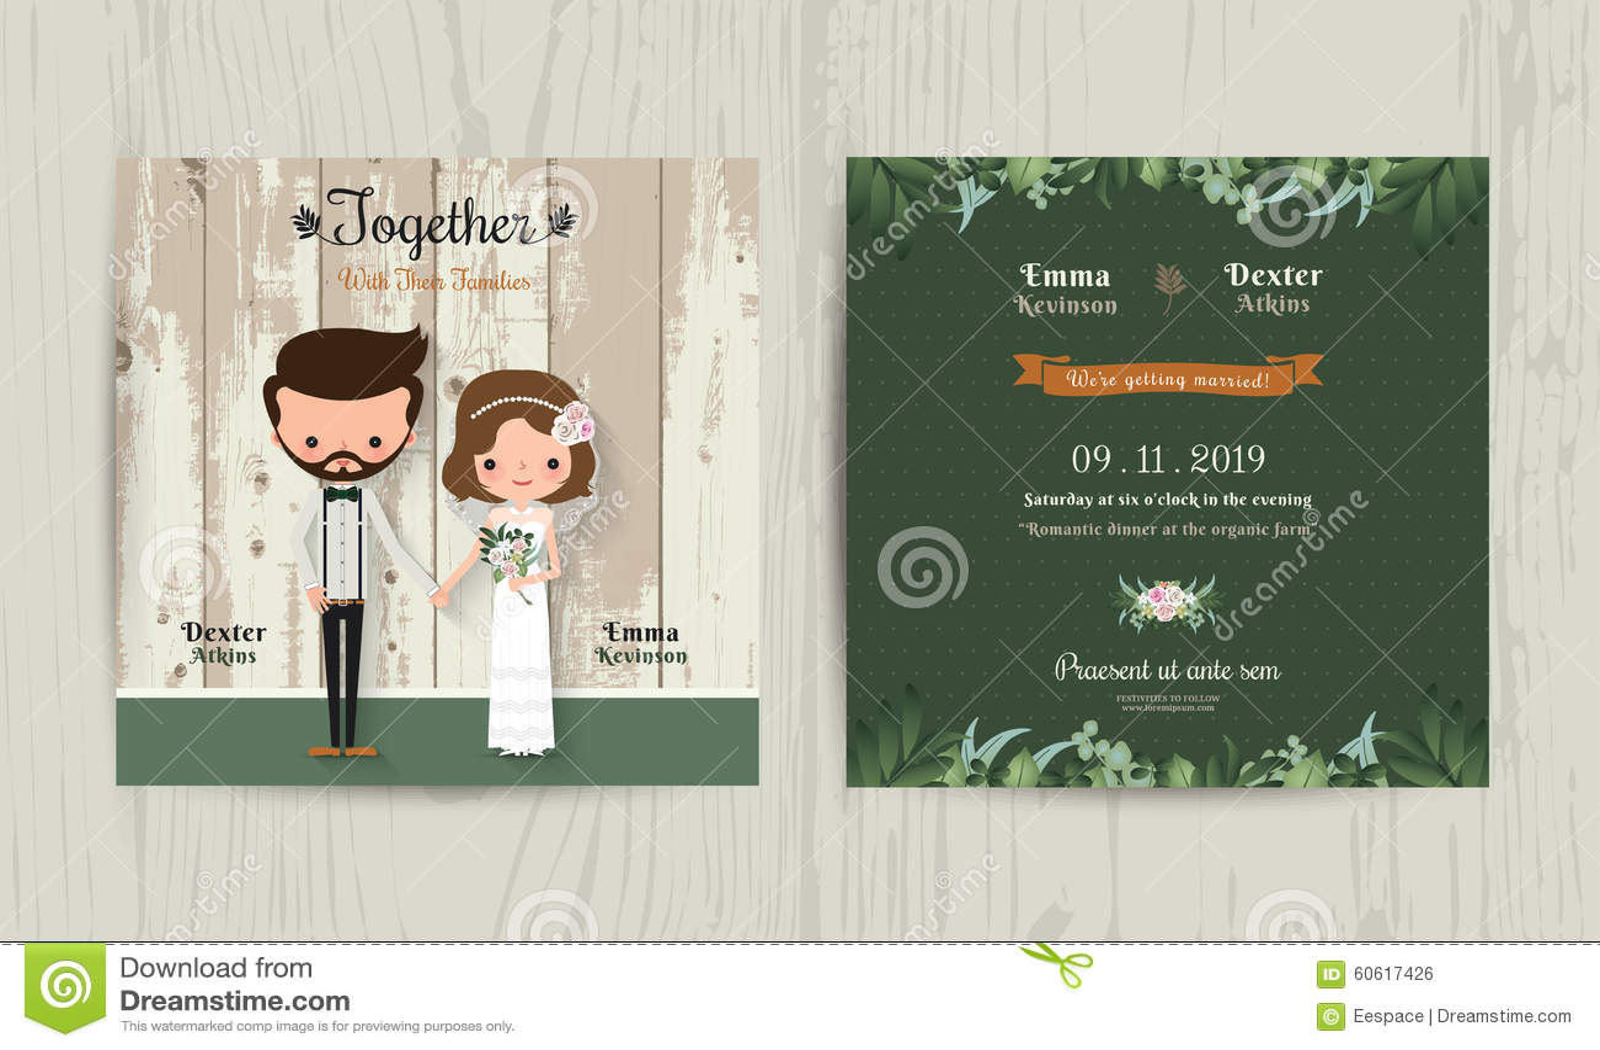 Rustic Wedding Invitations Background